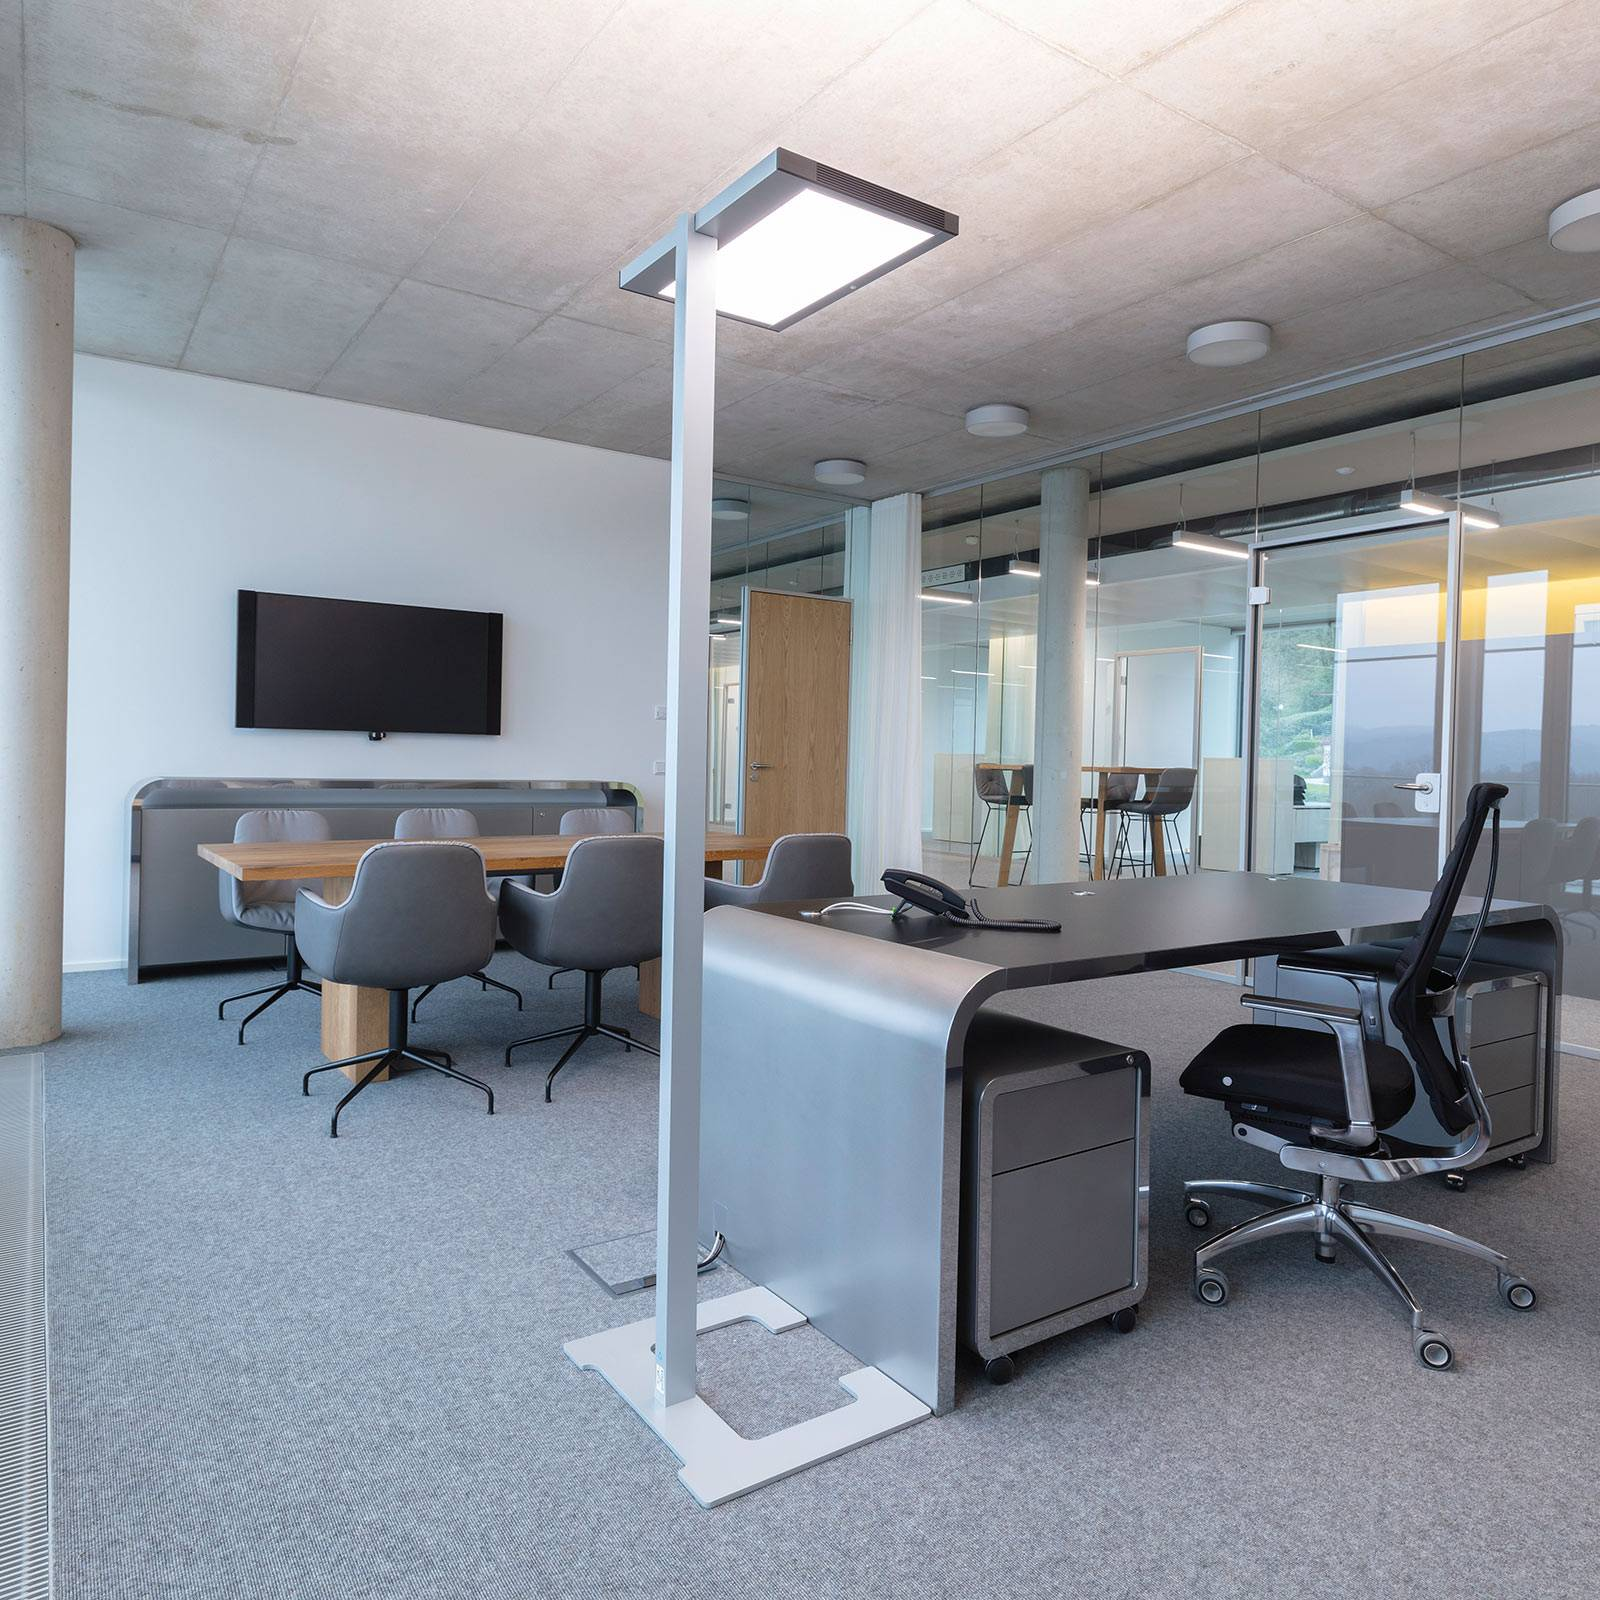 Luctra Vitawork LED-toimistolattiavalo 17000 lm